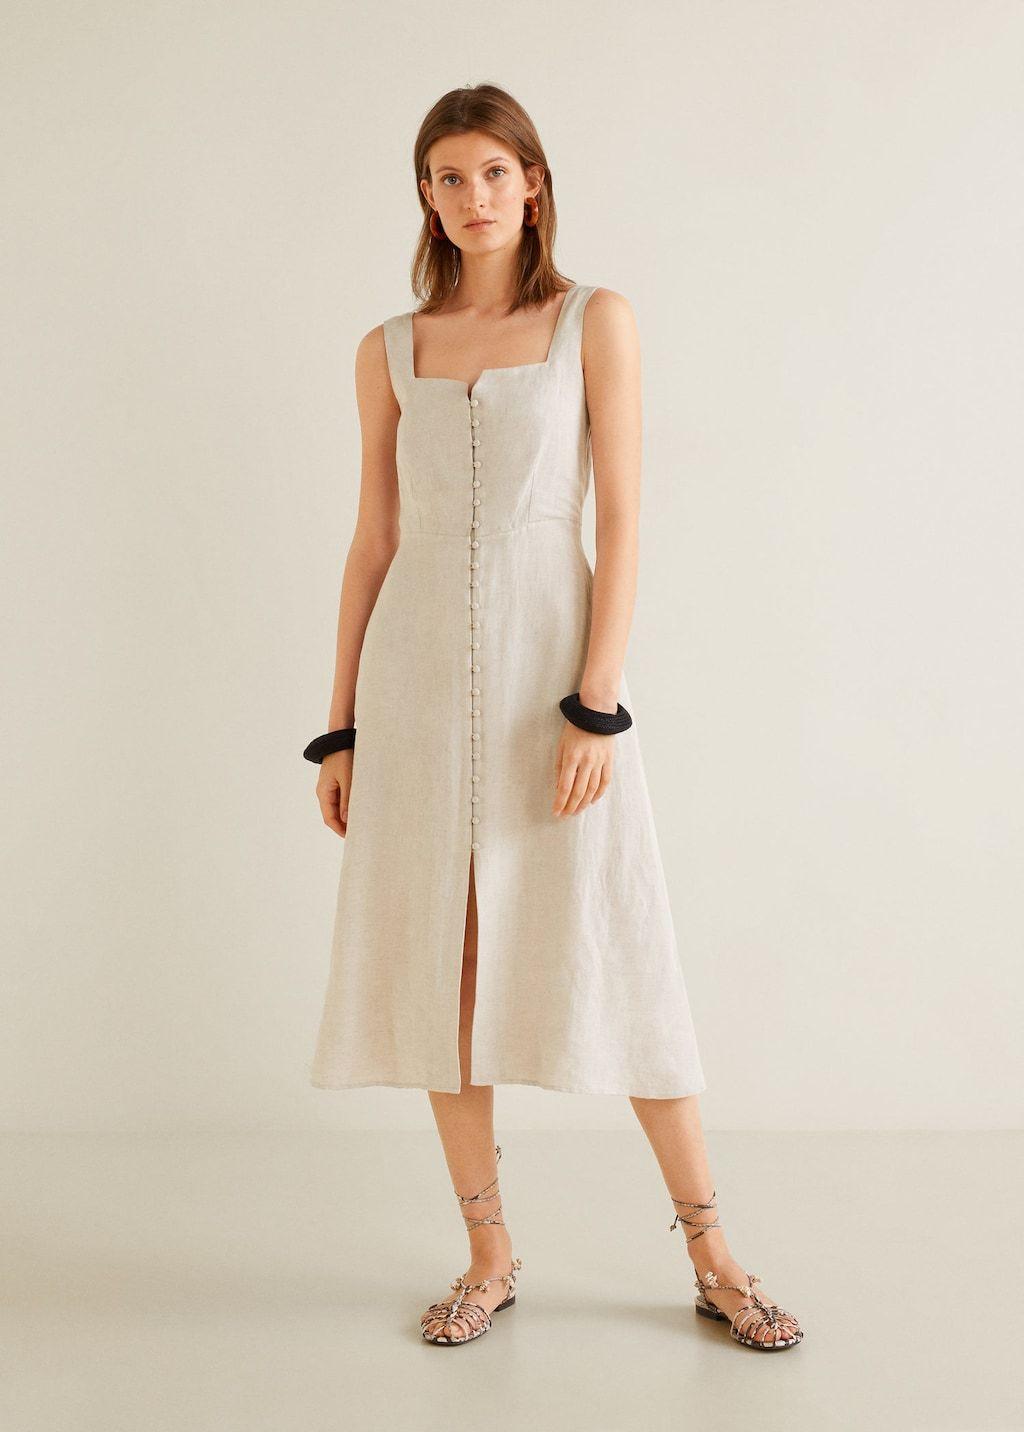 Buttoned midi dress - Woman  Mango Ireland  Womens midi dresses